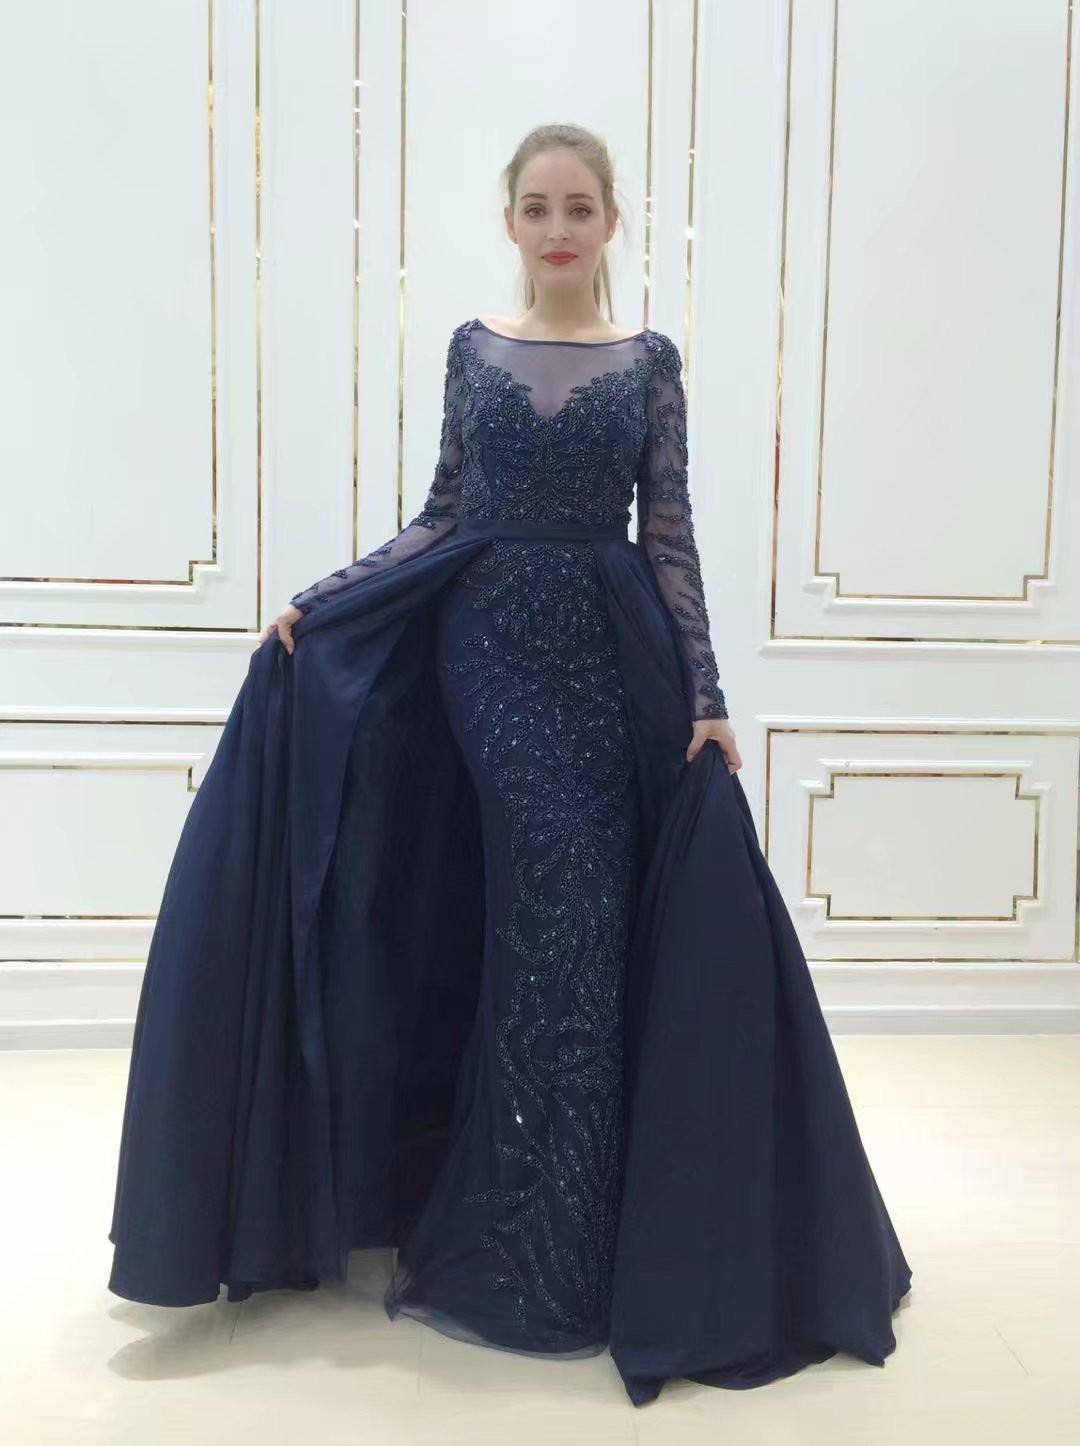 Matric Farewell Prom Make Up: Matric Dance & Farewell Dresses For